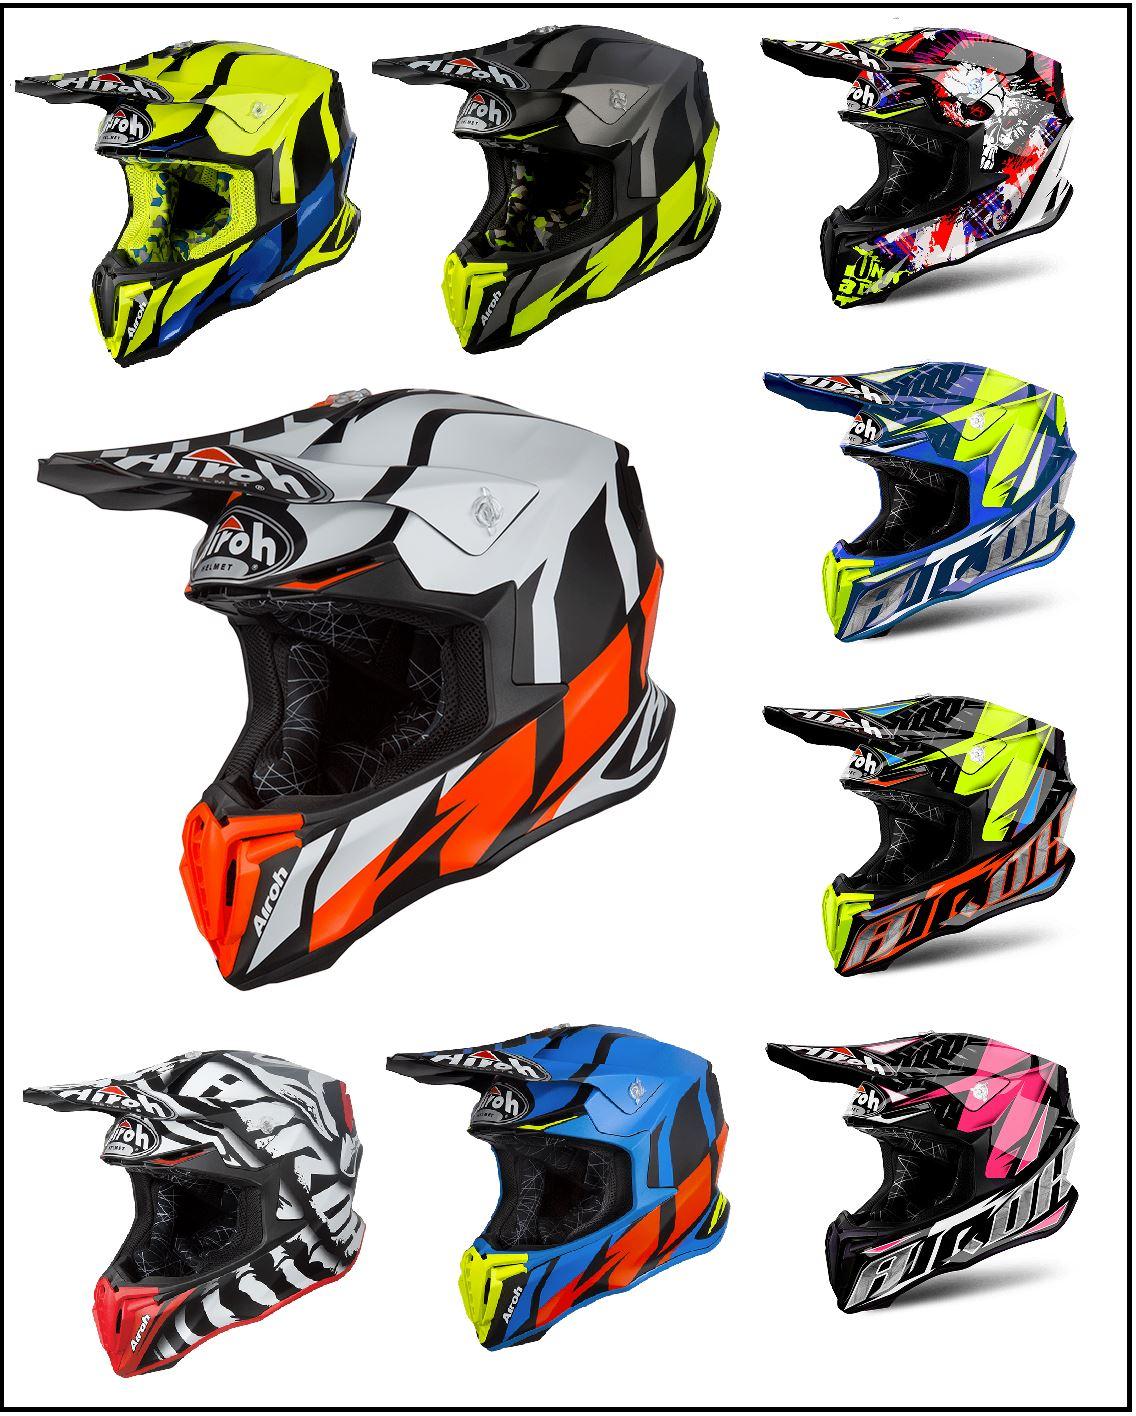 Legend Special Order All Sizes Airoh Helmets Twist Unisex Helmet Moto